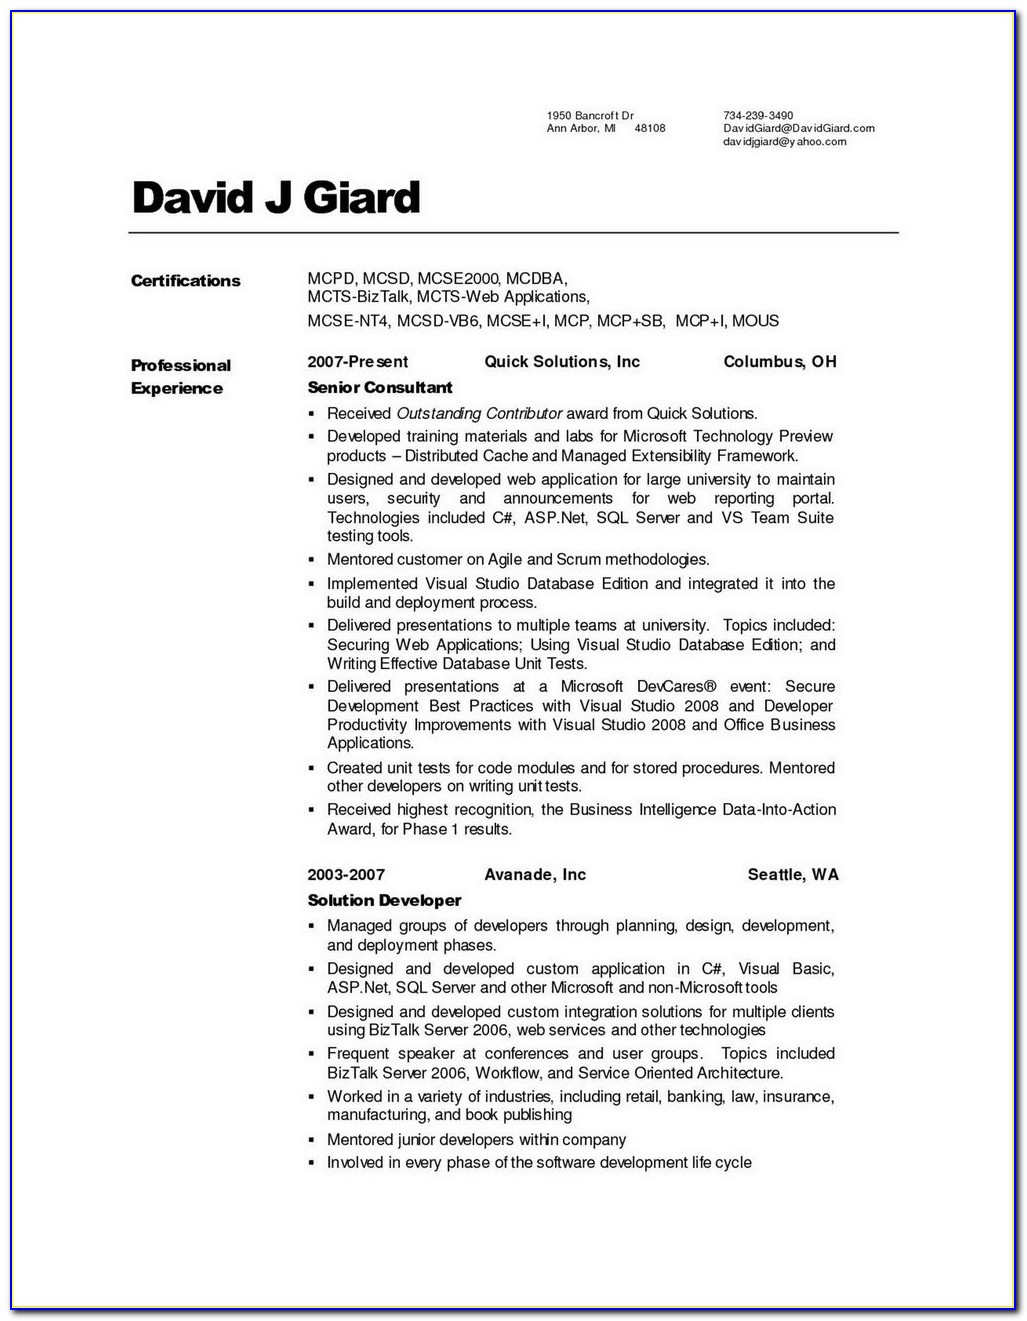 Federal Resume Writing Services Washington Dc